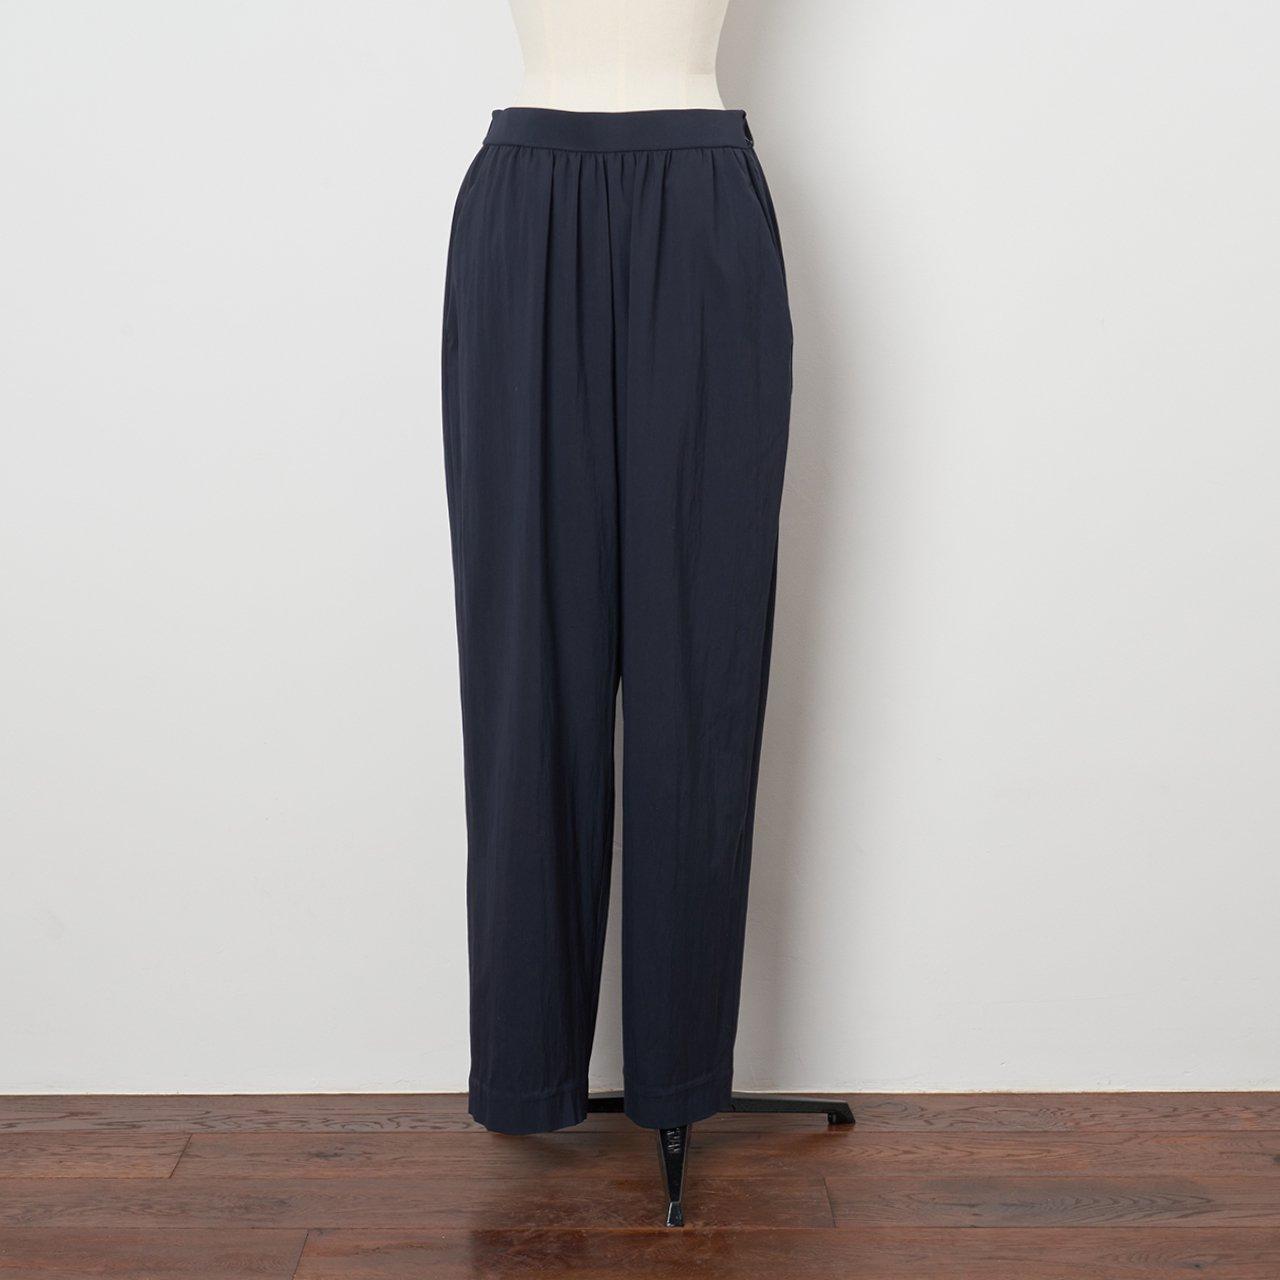 Pale Jute <BR>basic gather pants<BR>navy